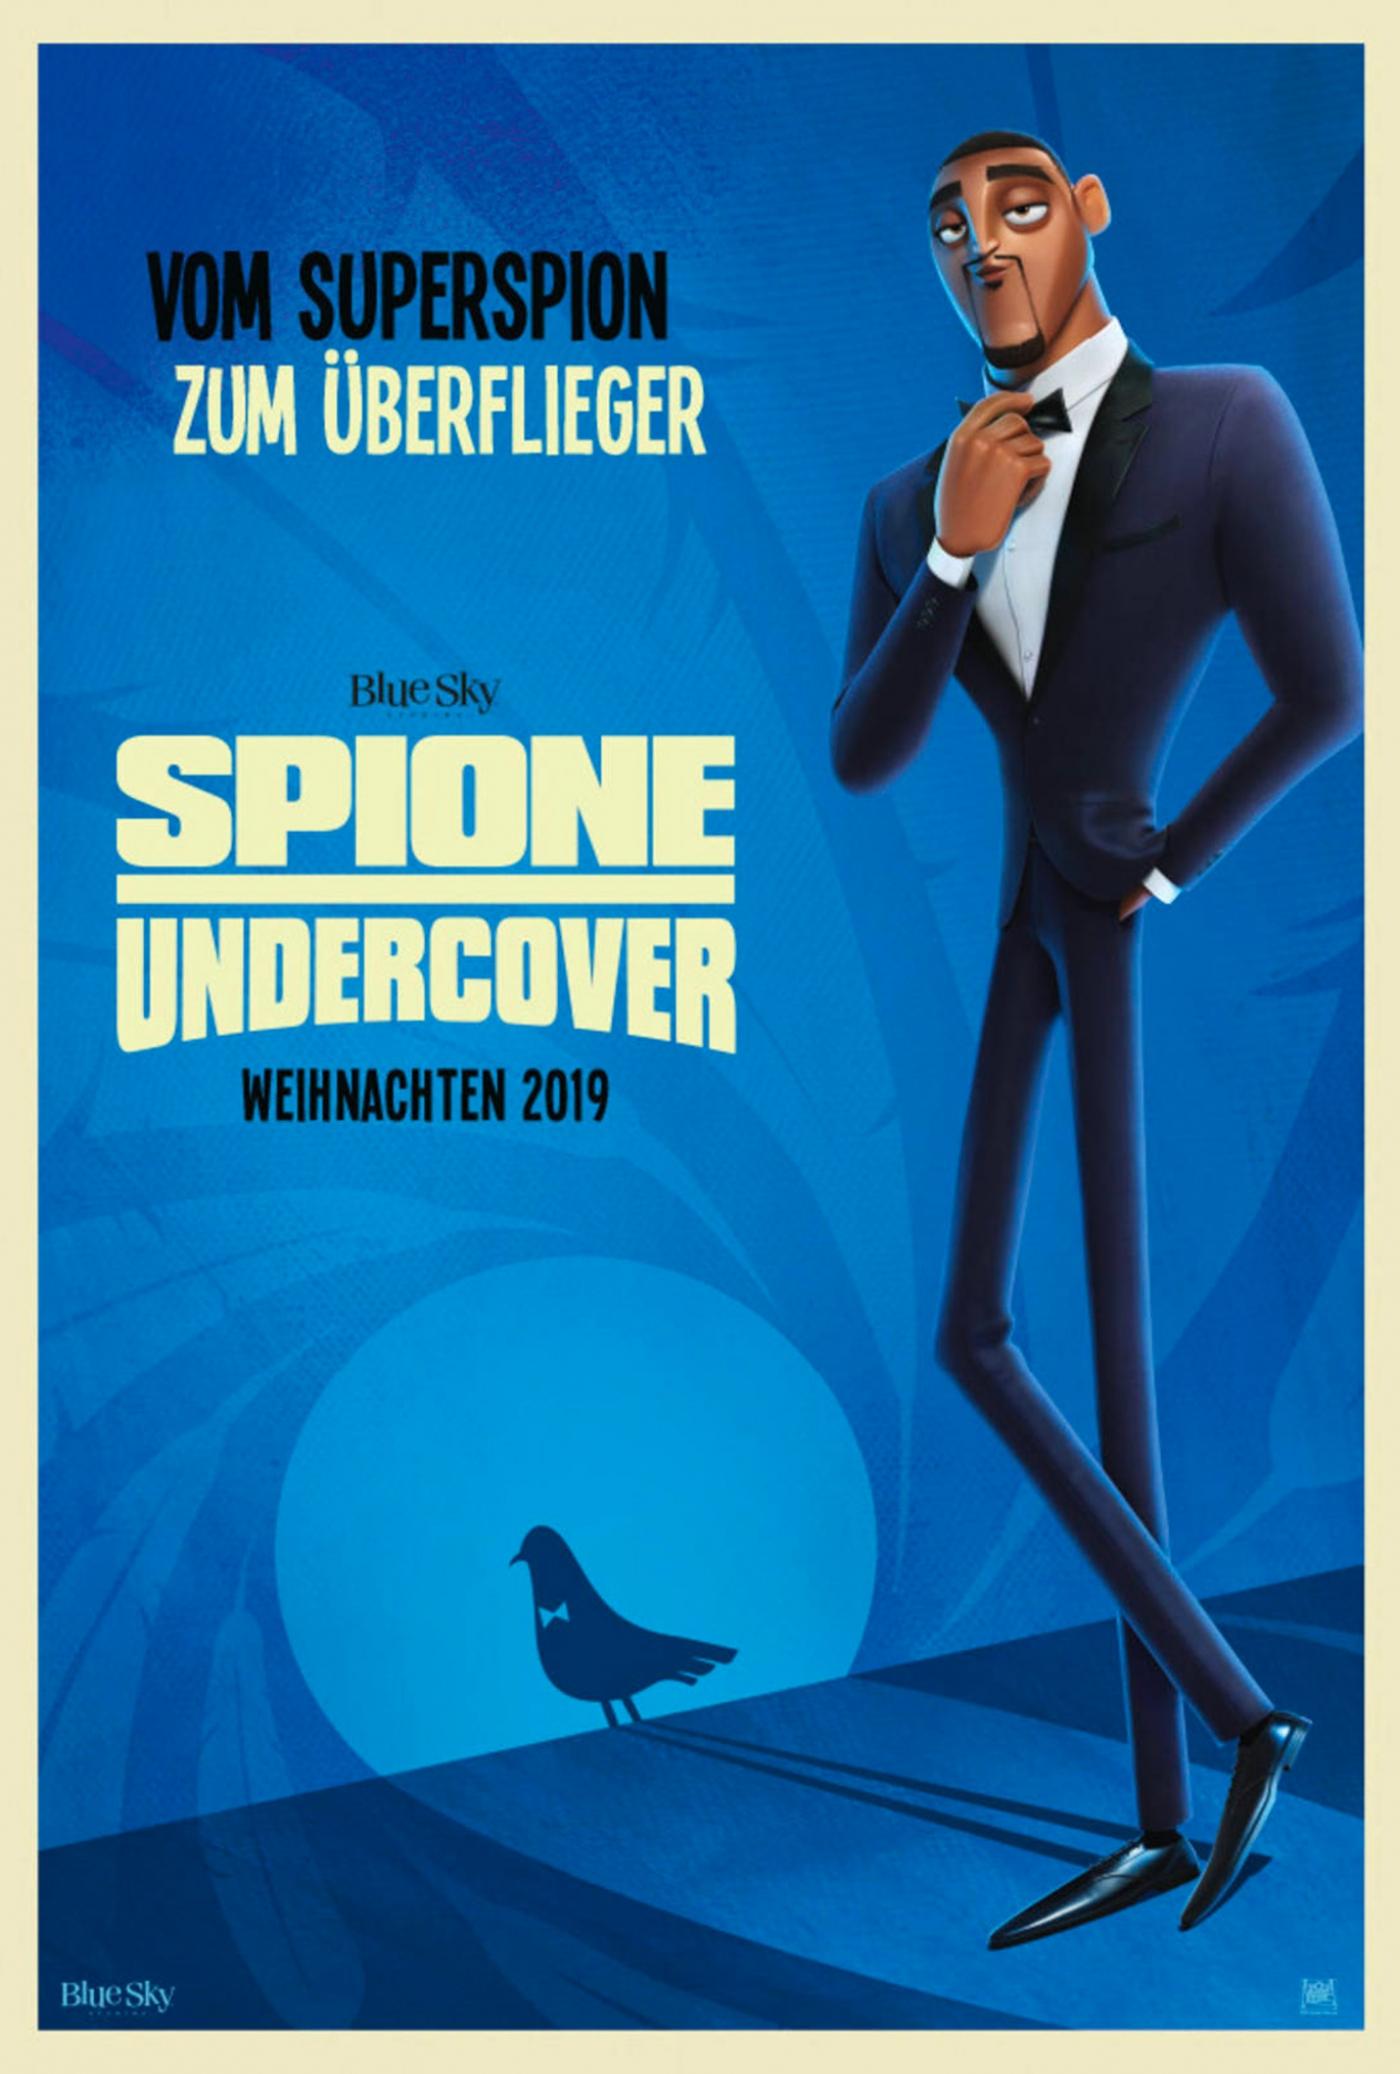 2D: SPIONE UNDERCOVER